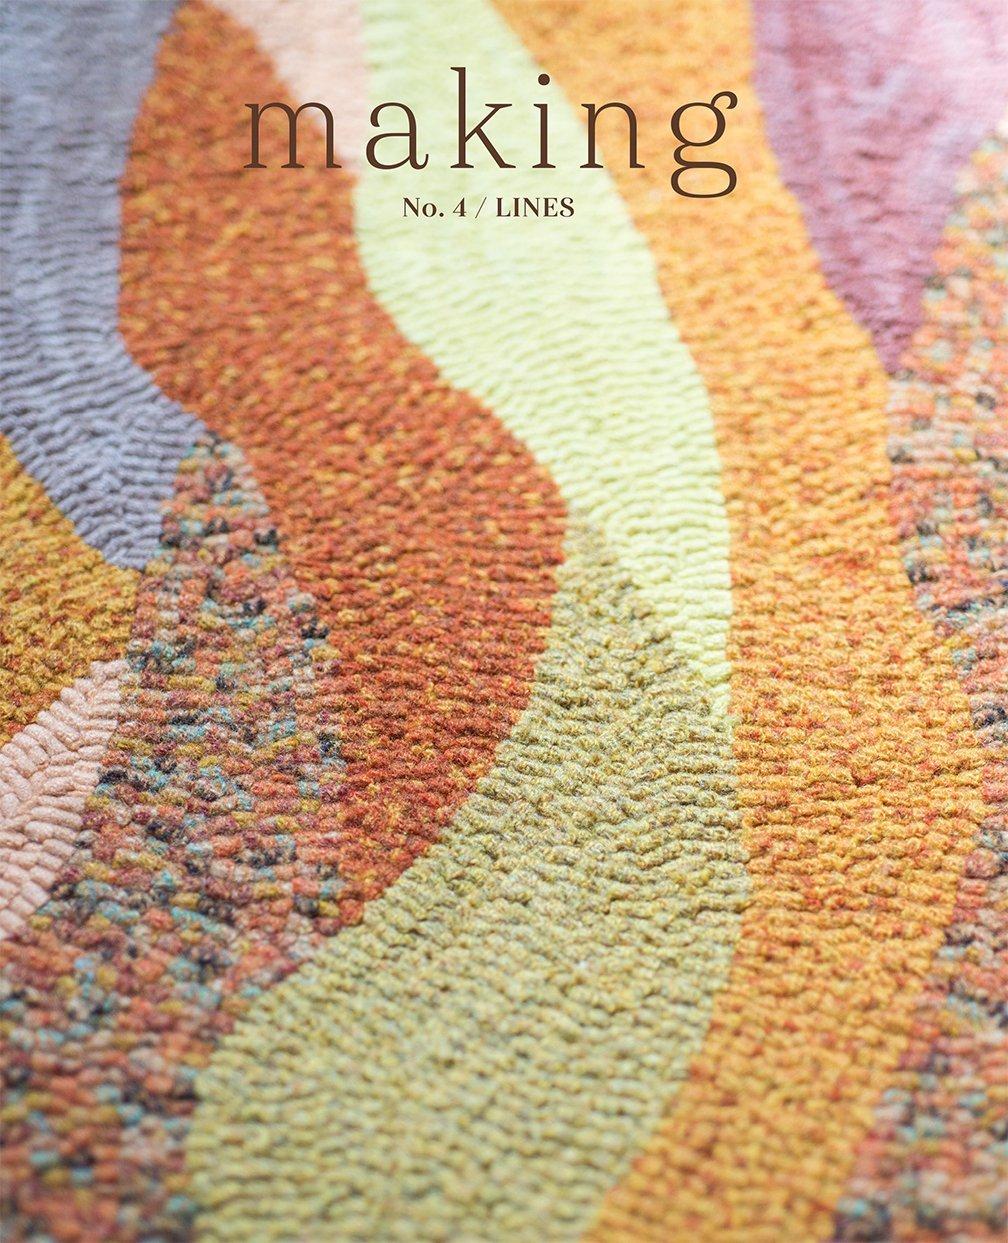 Making Magazine No. 4 Lines